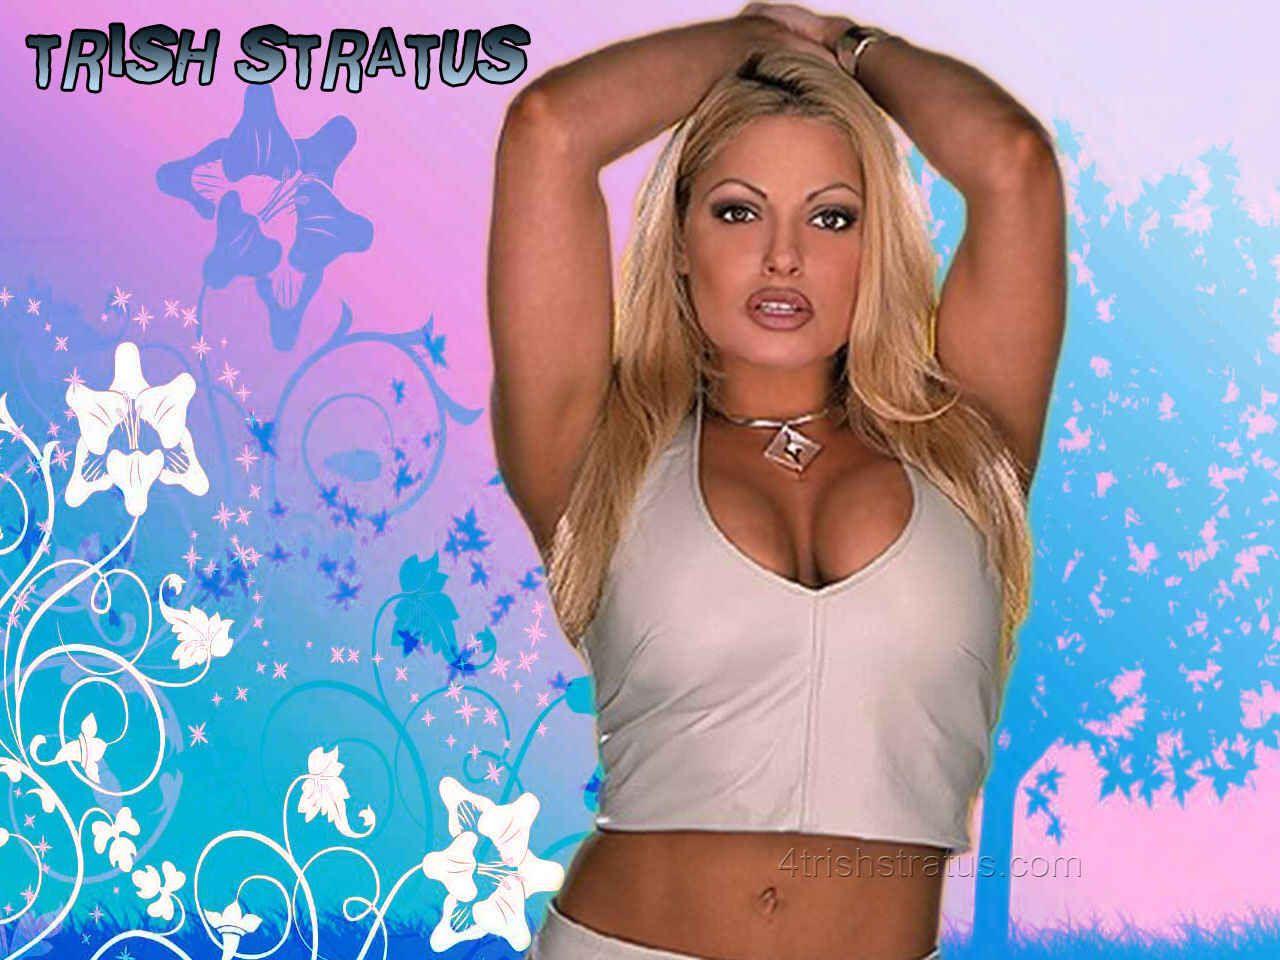 Download Trish Stratus Hd Hot Wallpapers Wallpaper Hd Free X Trish Stratus Wallpapers  Wallpapers Adorable Wallpapers